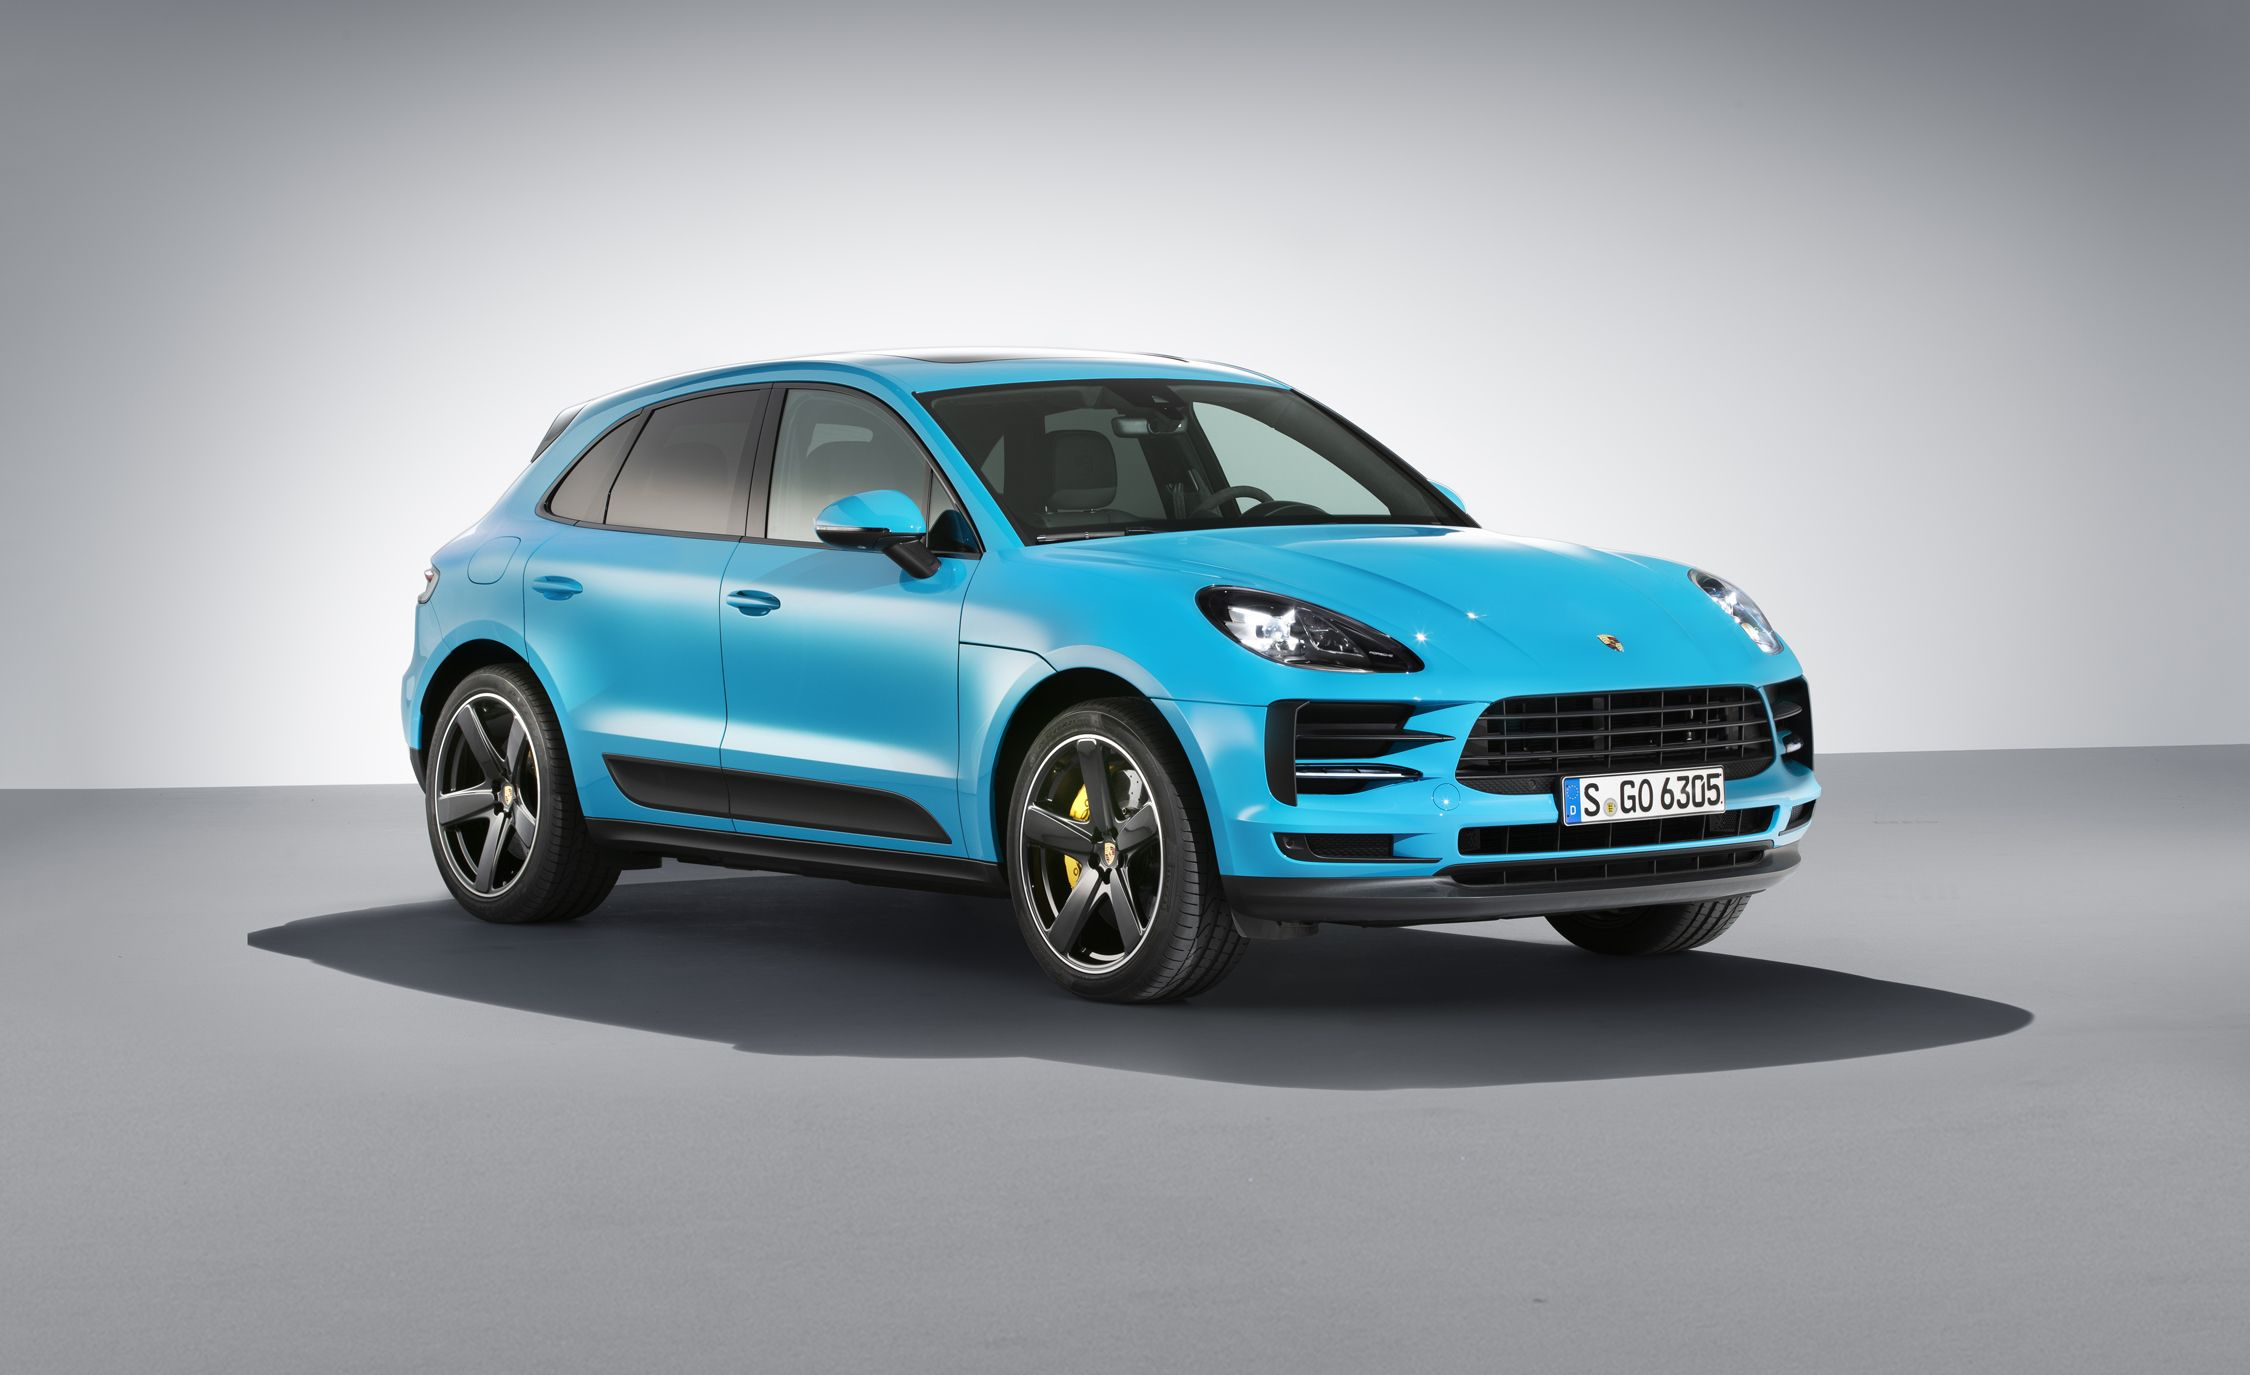 2018 Porsche Cayenne Release Date >> 2019 Porsche Macan: New Look, New V-6s, More Power | News | Car and Driver